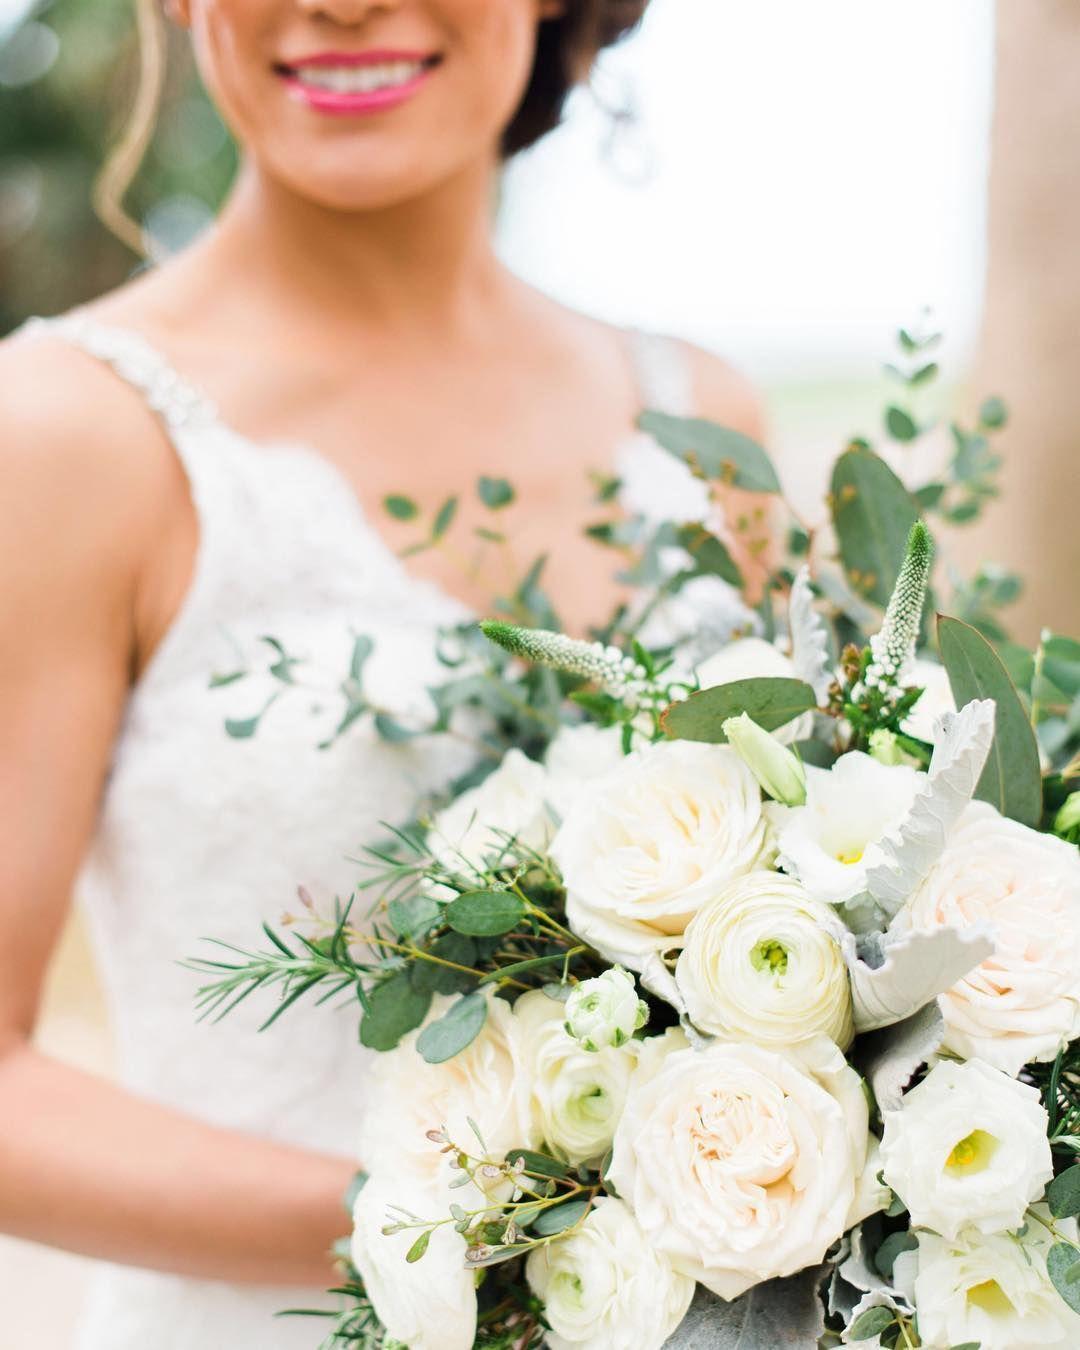 "It's a ""work, work, work, work, work day!"" Any @thejadebennett followers in the house? If not, you won't get that reference. But if you know, you know! . . . . .  #ohiobride #ohiobridetobe #waxsealstamp #weddingdaydetails #onthemenu #weddingmenus #weddingprograms #weddingtablenumbers #tablenumbers #silkribbon #foilinvitations #sobridaltheory #stationeryaddict #paperlove #curatedweddings #papercraft #weddingcolors #snailmail #dayofdetails #wvweddings #wvbride #wvbridetobe #classicwedding #minimal"